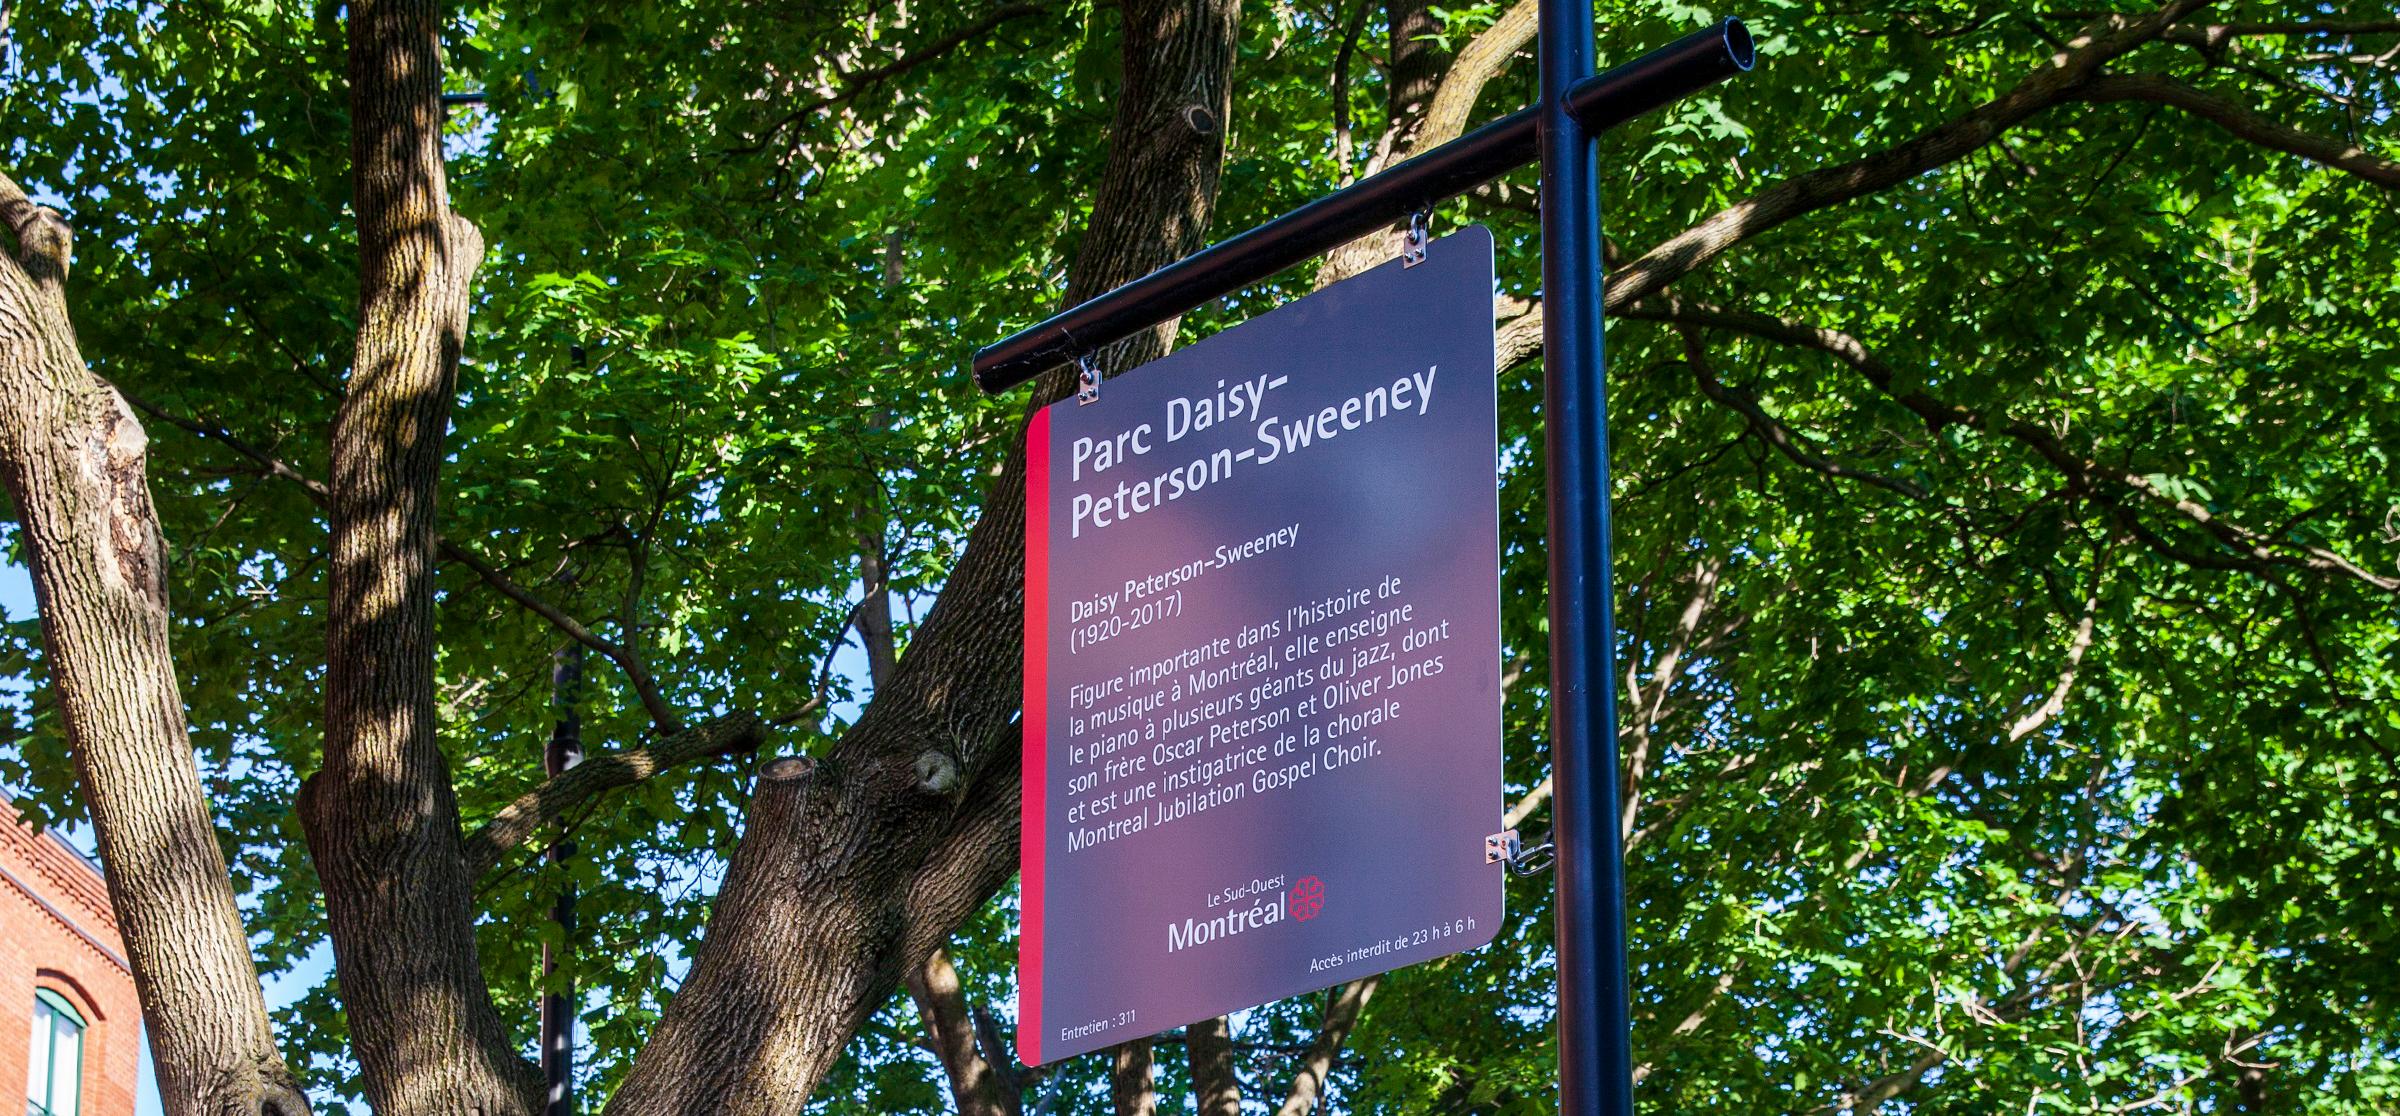 Parc Daisy-Peterson-Sweeney - Daisy Peterson Sweeney Park